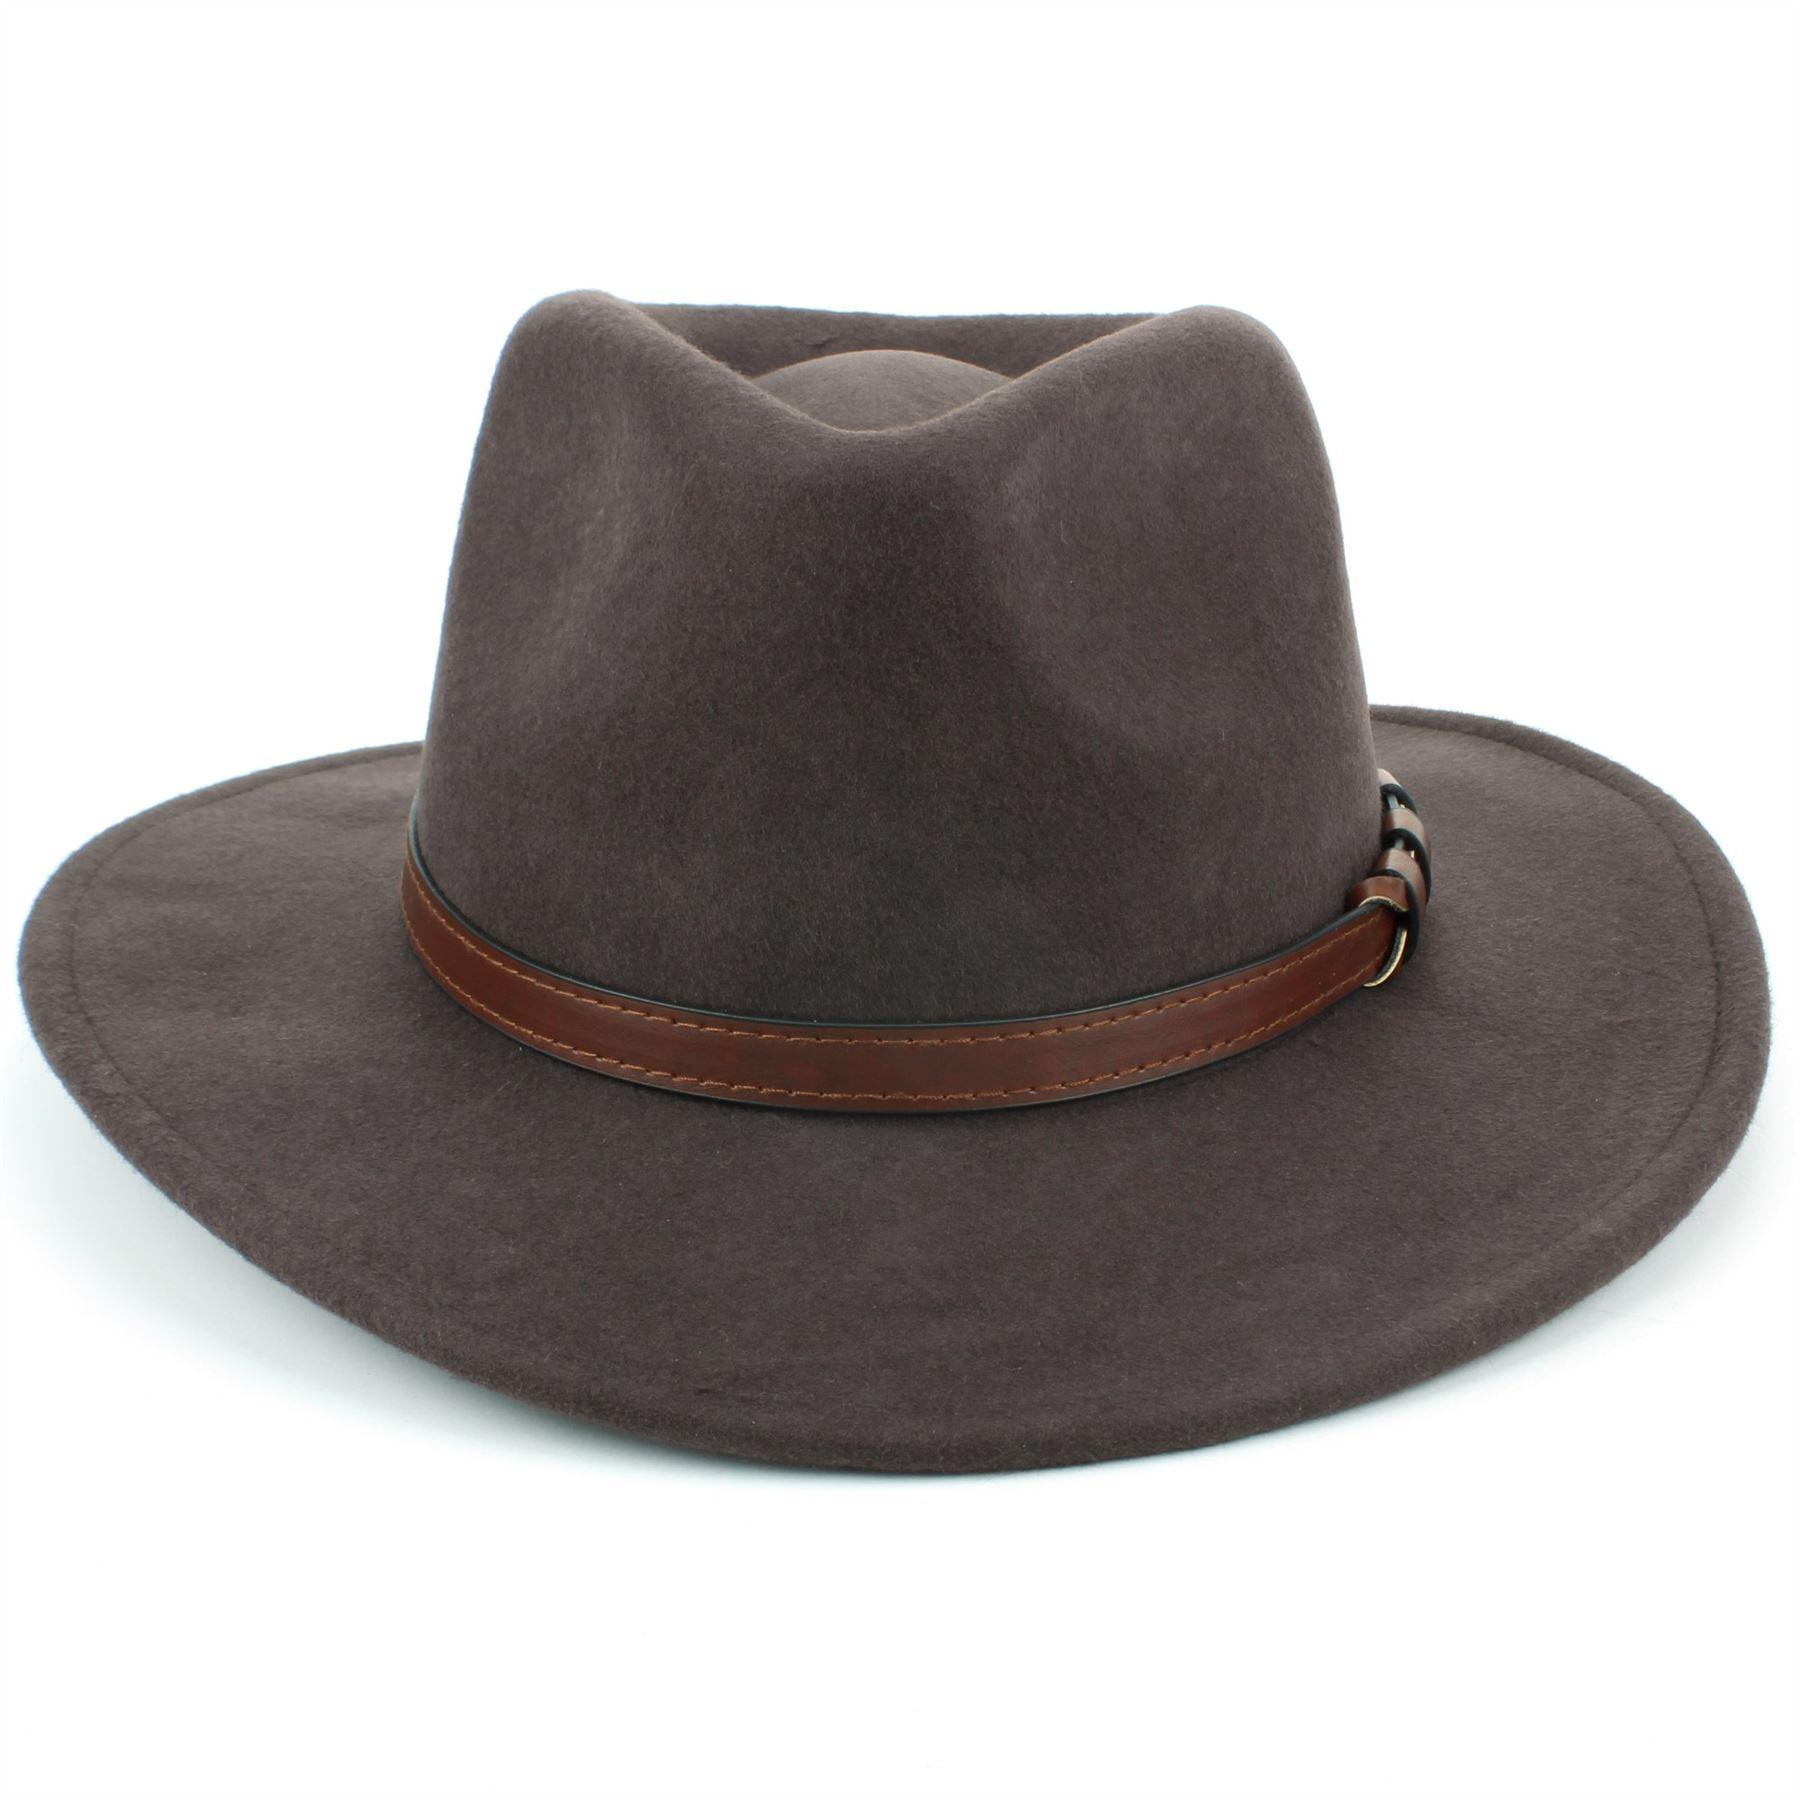 Fedora-Hat-Wool-BLACK-BROWN-Hawkins-Trilby-Brim-Mens-Ladies-Travel thumbnail 7